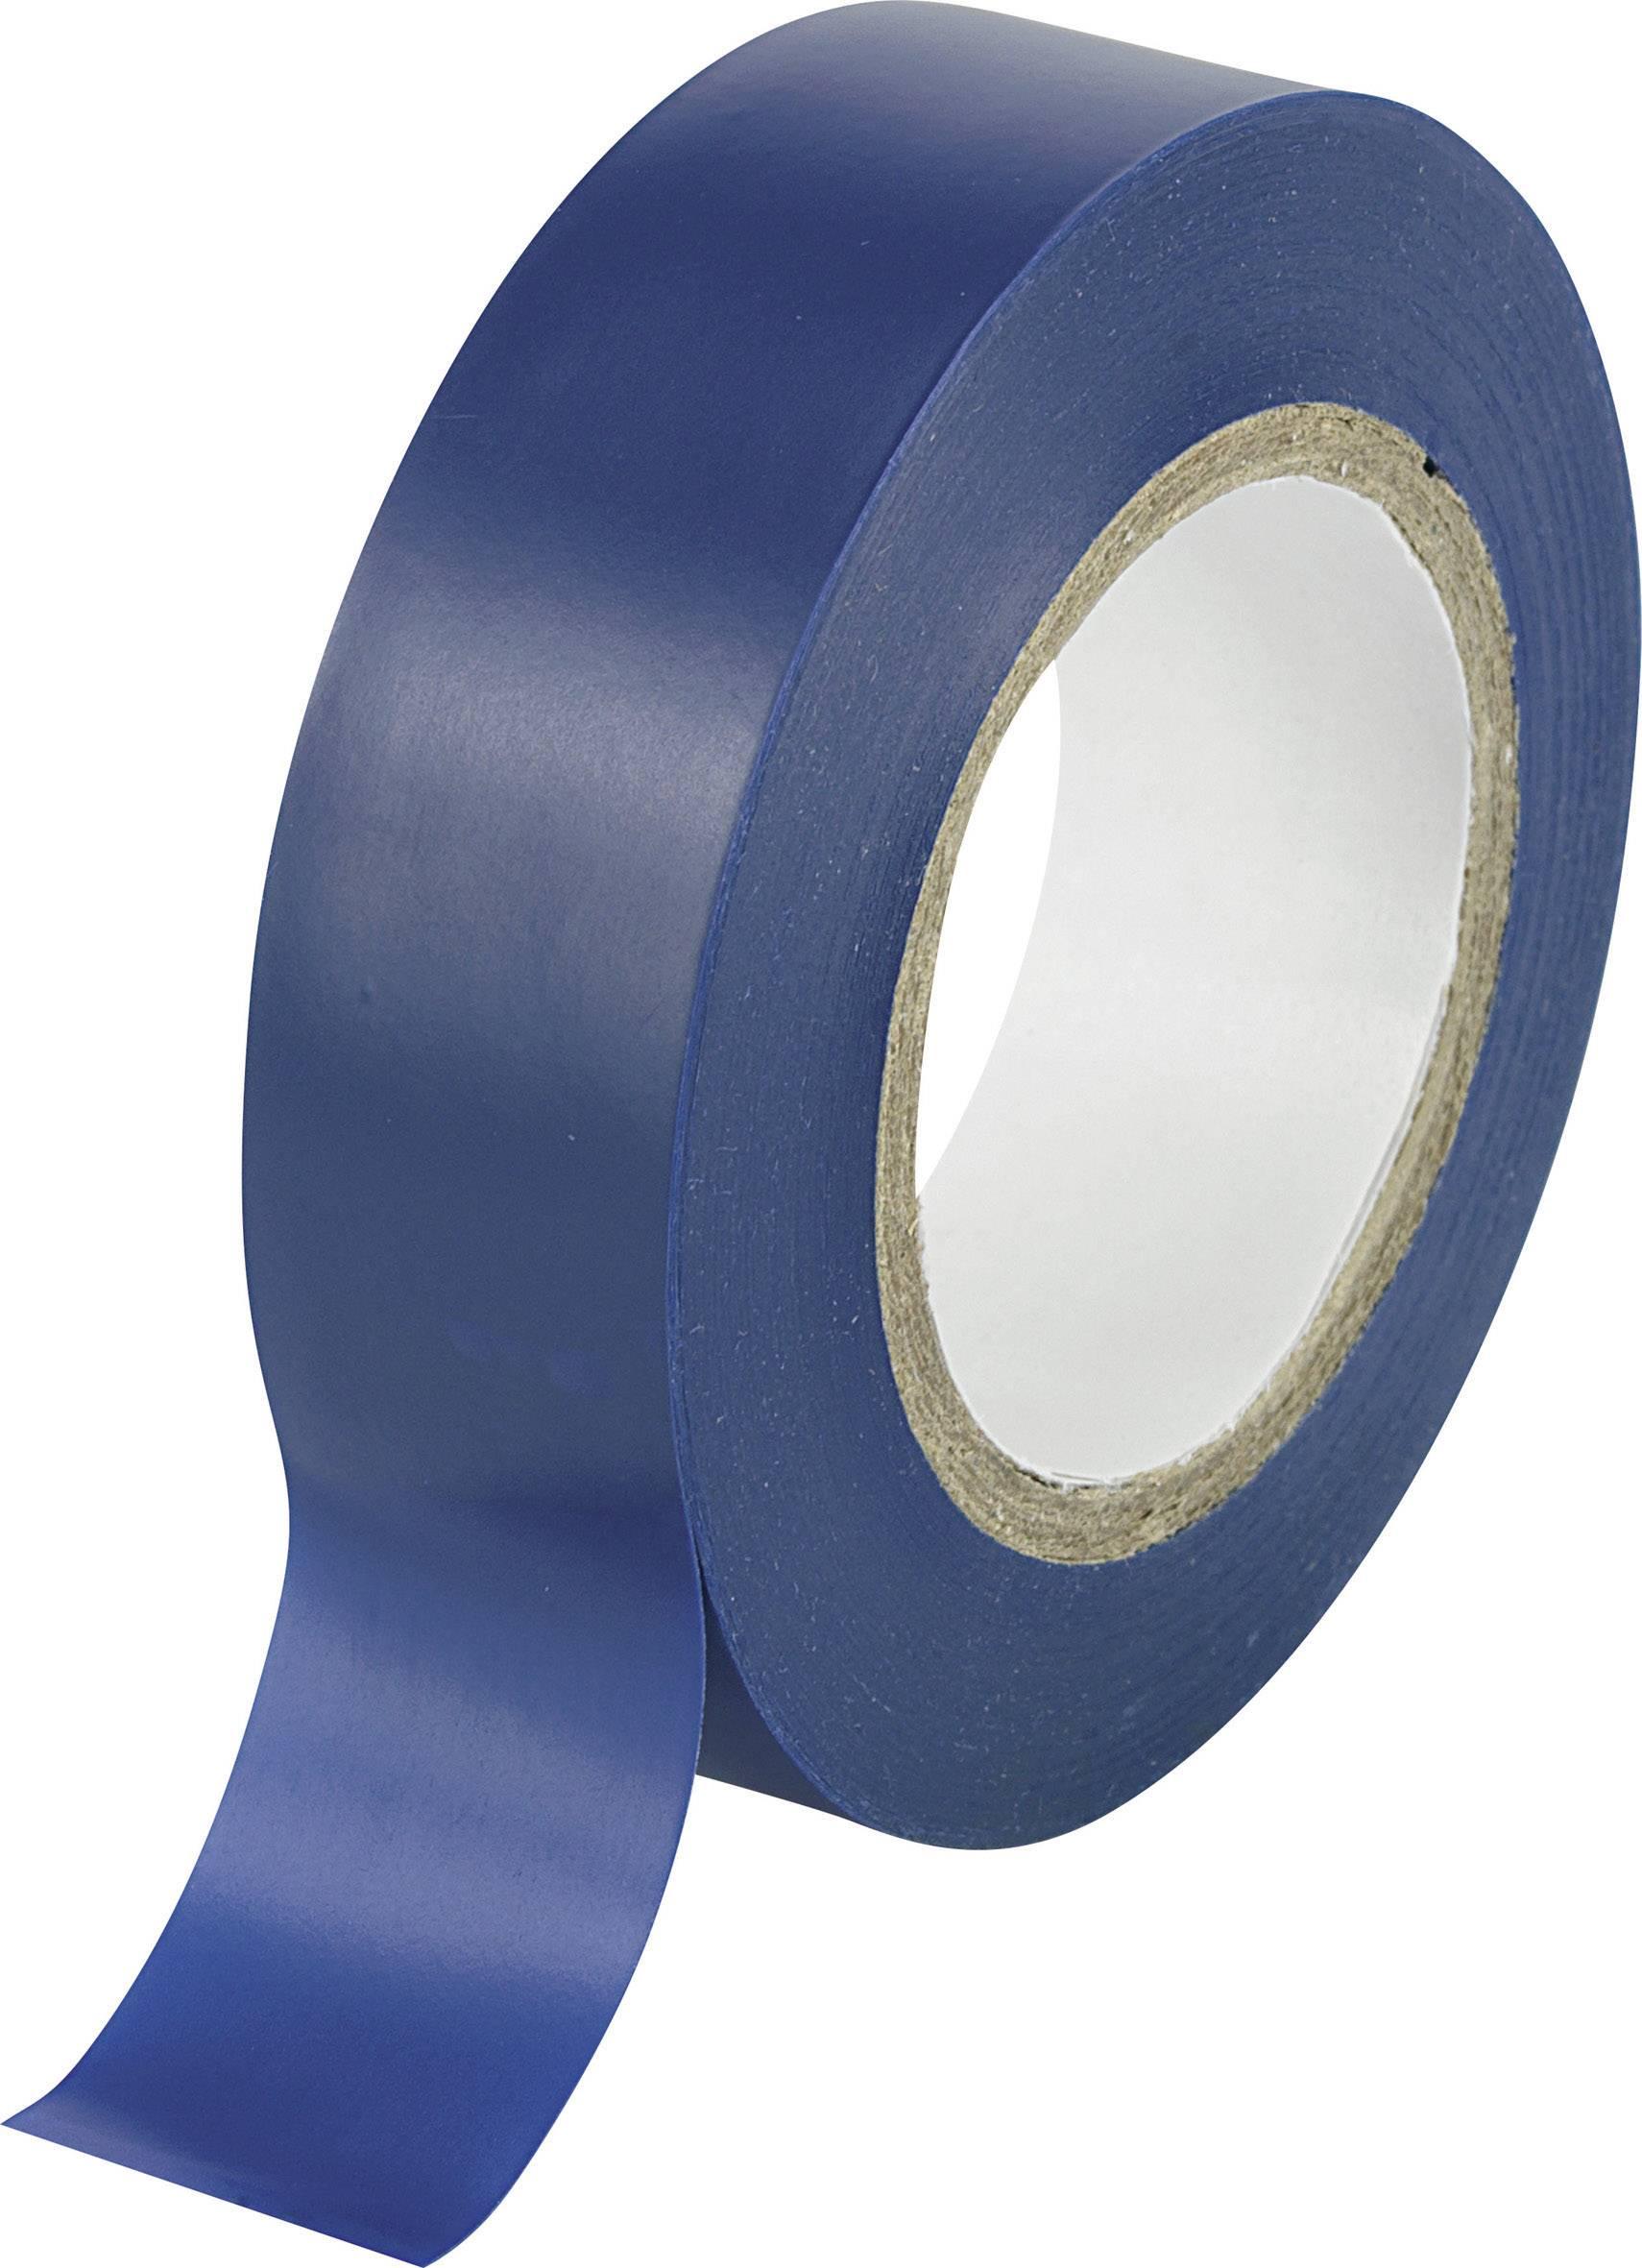 Izolační páska TRU COMPONENTS 1564109, (d x š) 25 m x 19 mm, modrá, 1 role